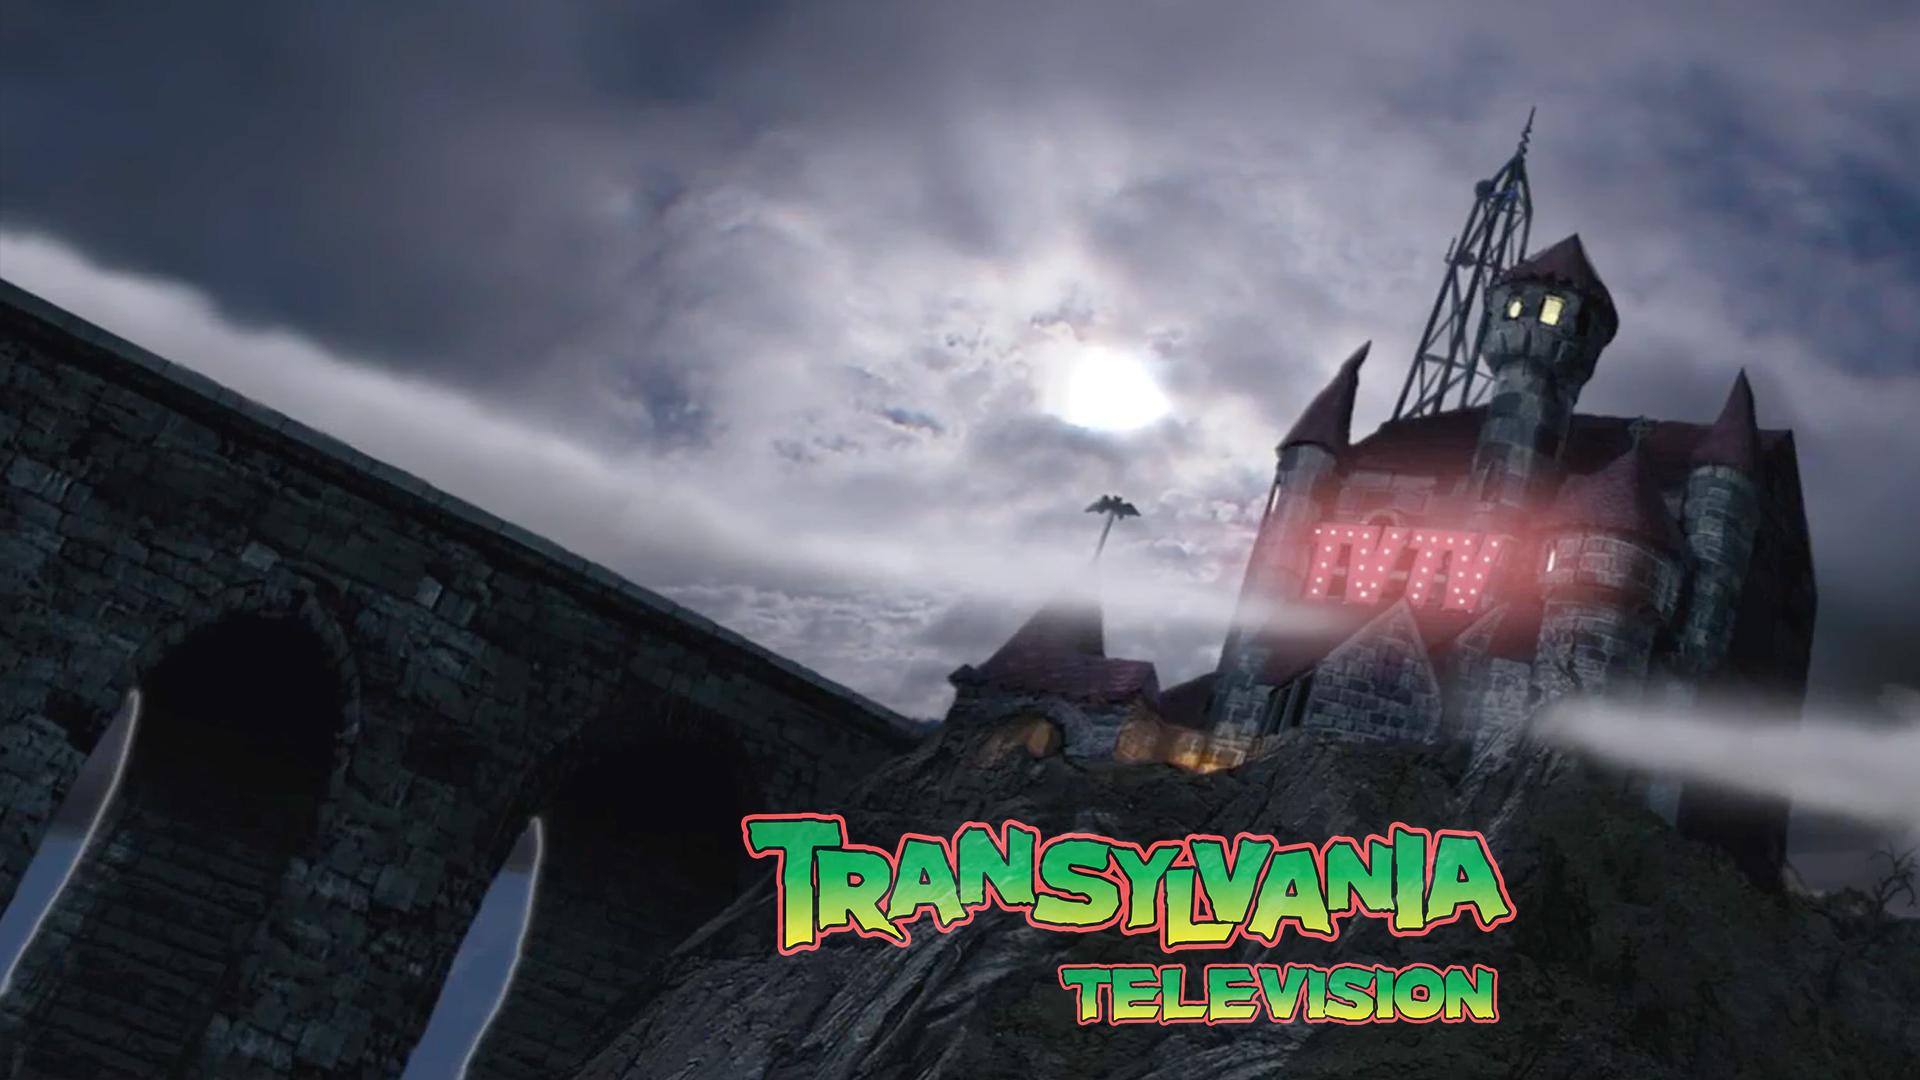 Transylvania Television